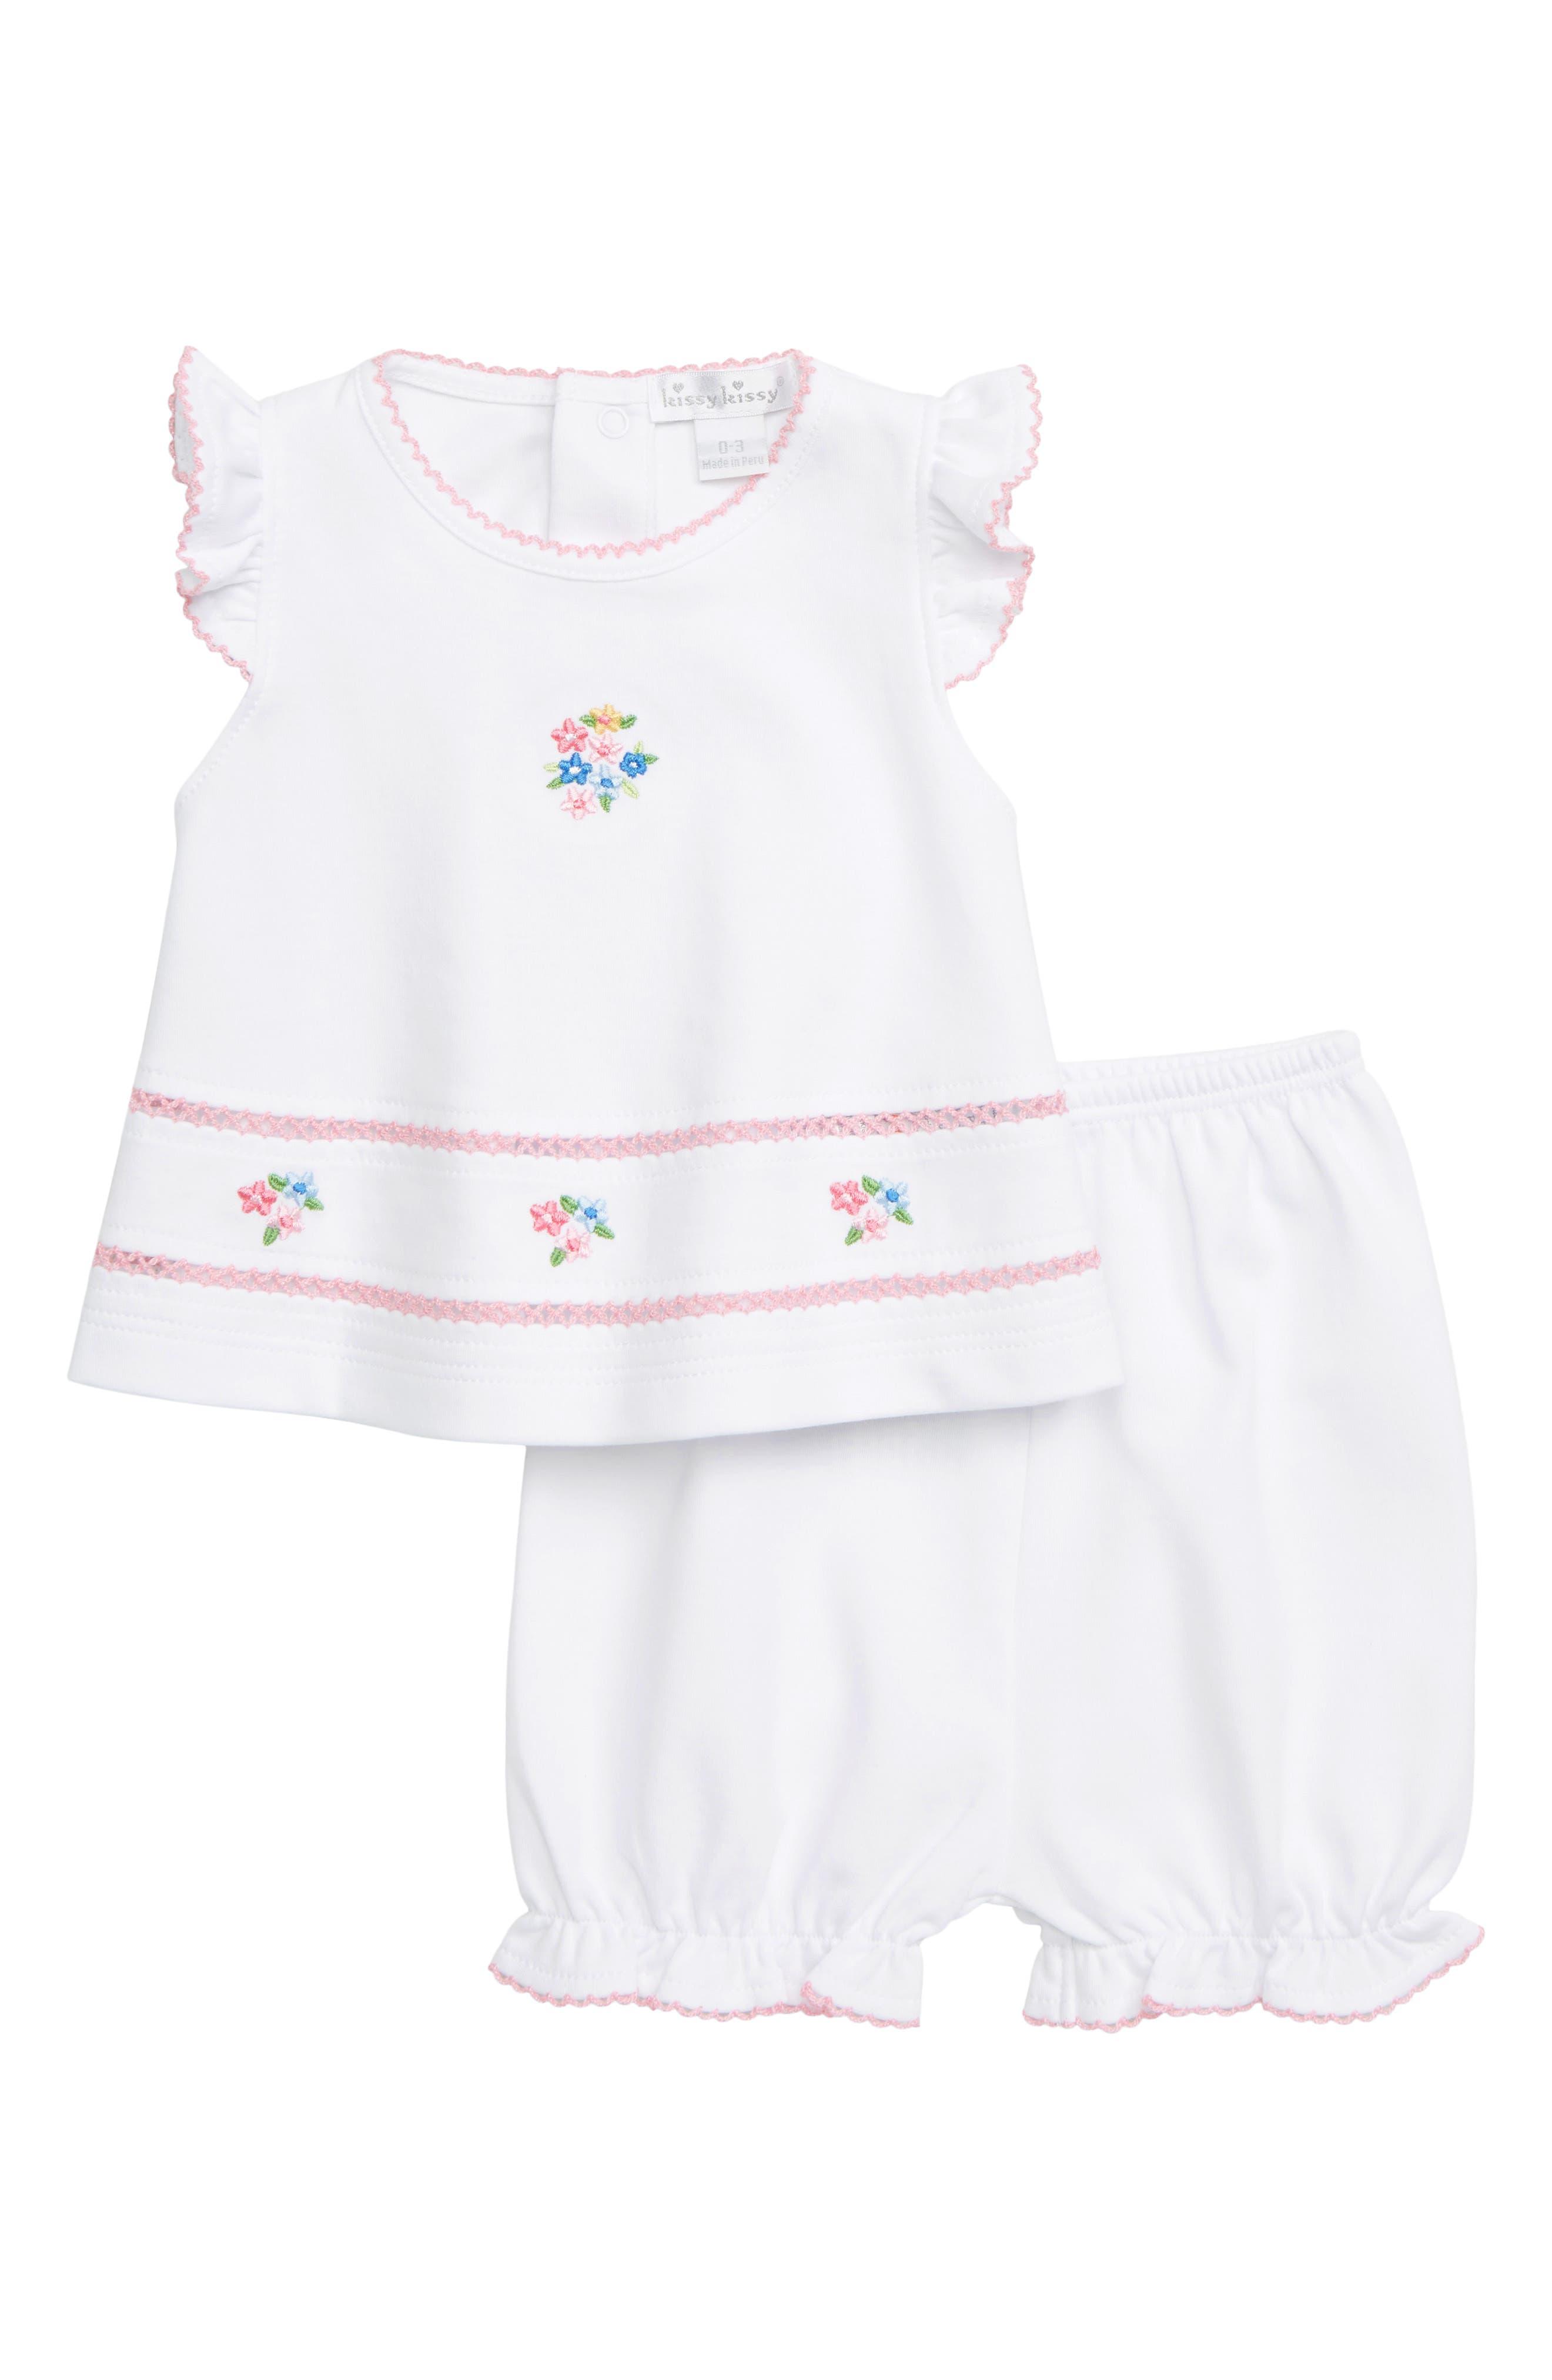 KISSY KISSY,                             Embroidered Shirt & Shorts Set,                             Main thumbnail 1, color,                             WHITE/ PINK